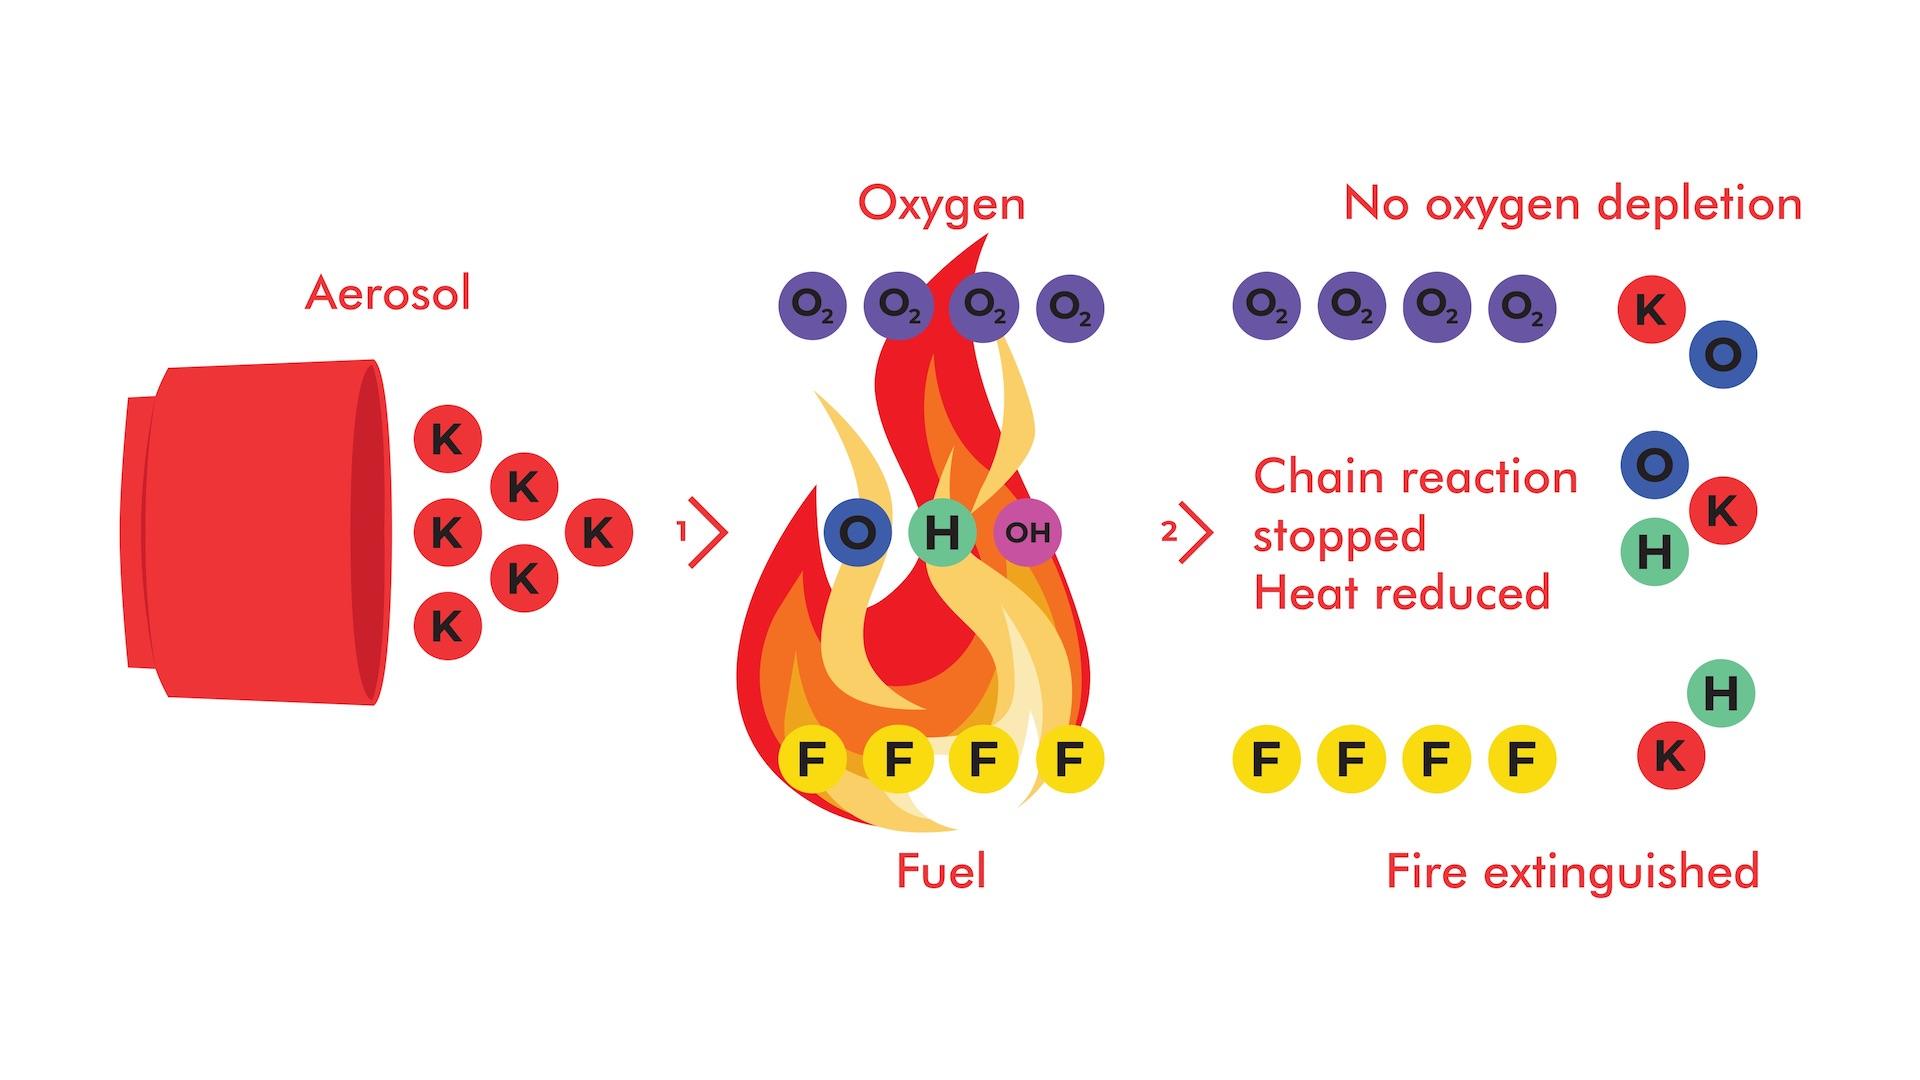 How does aerosol work as extinguishing agent